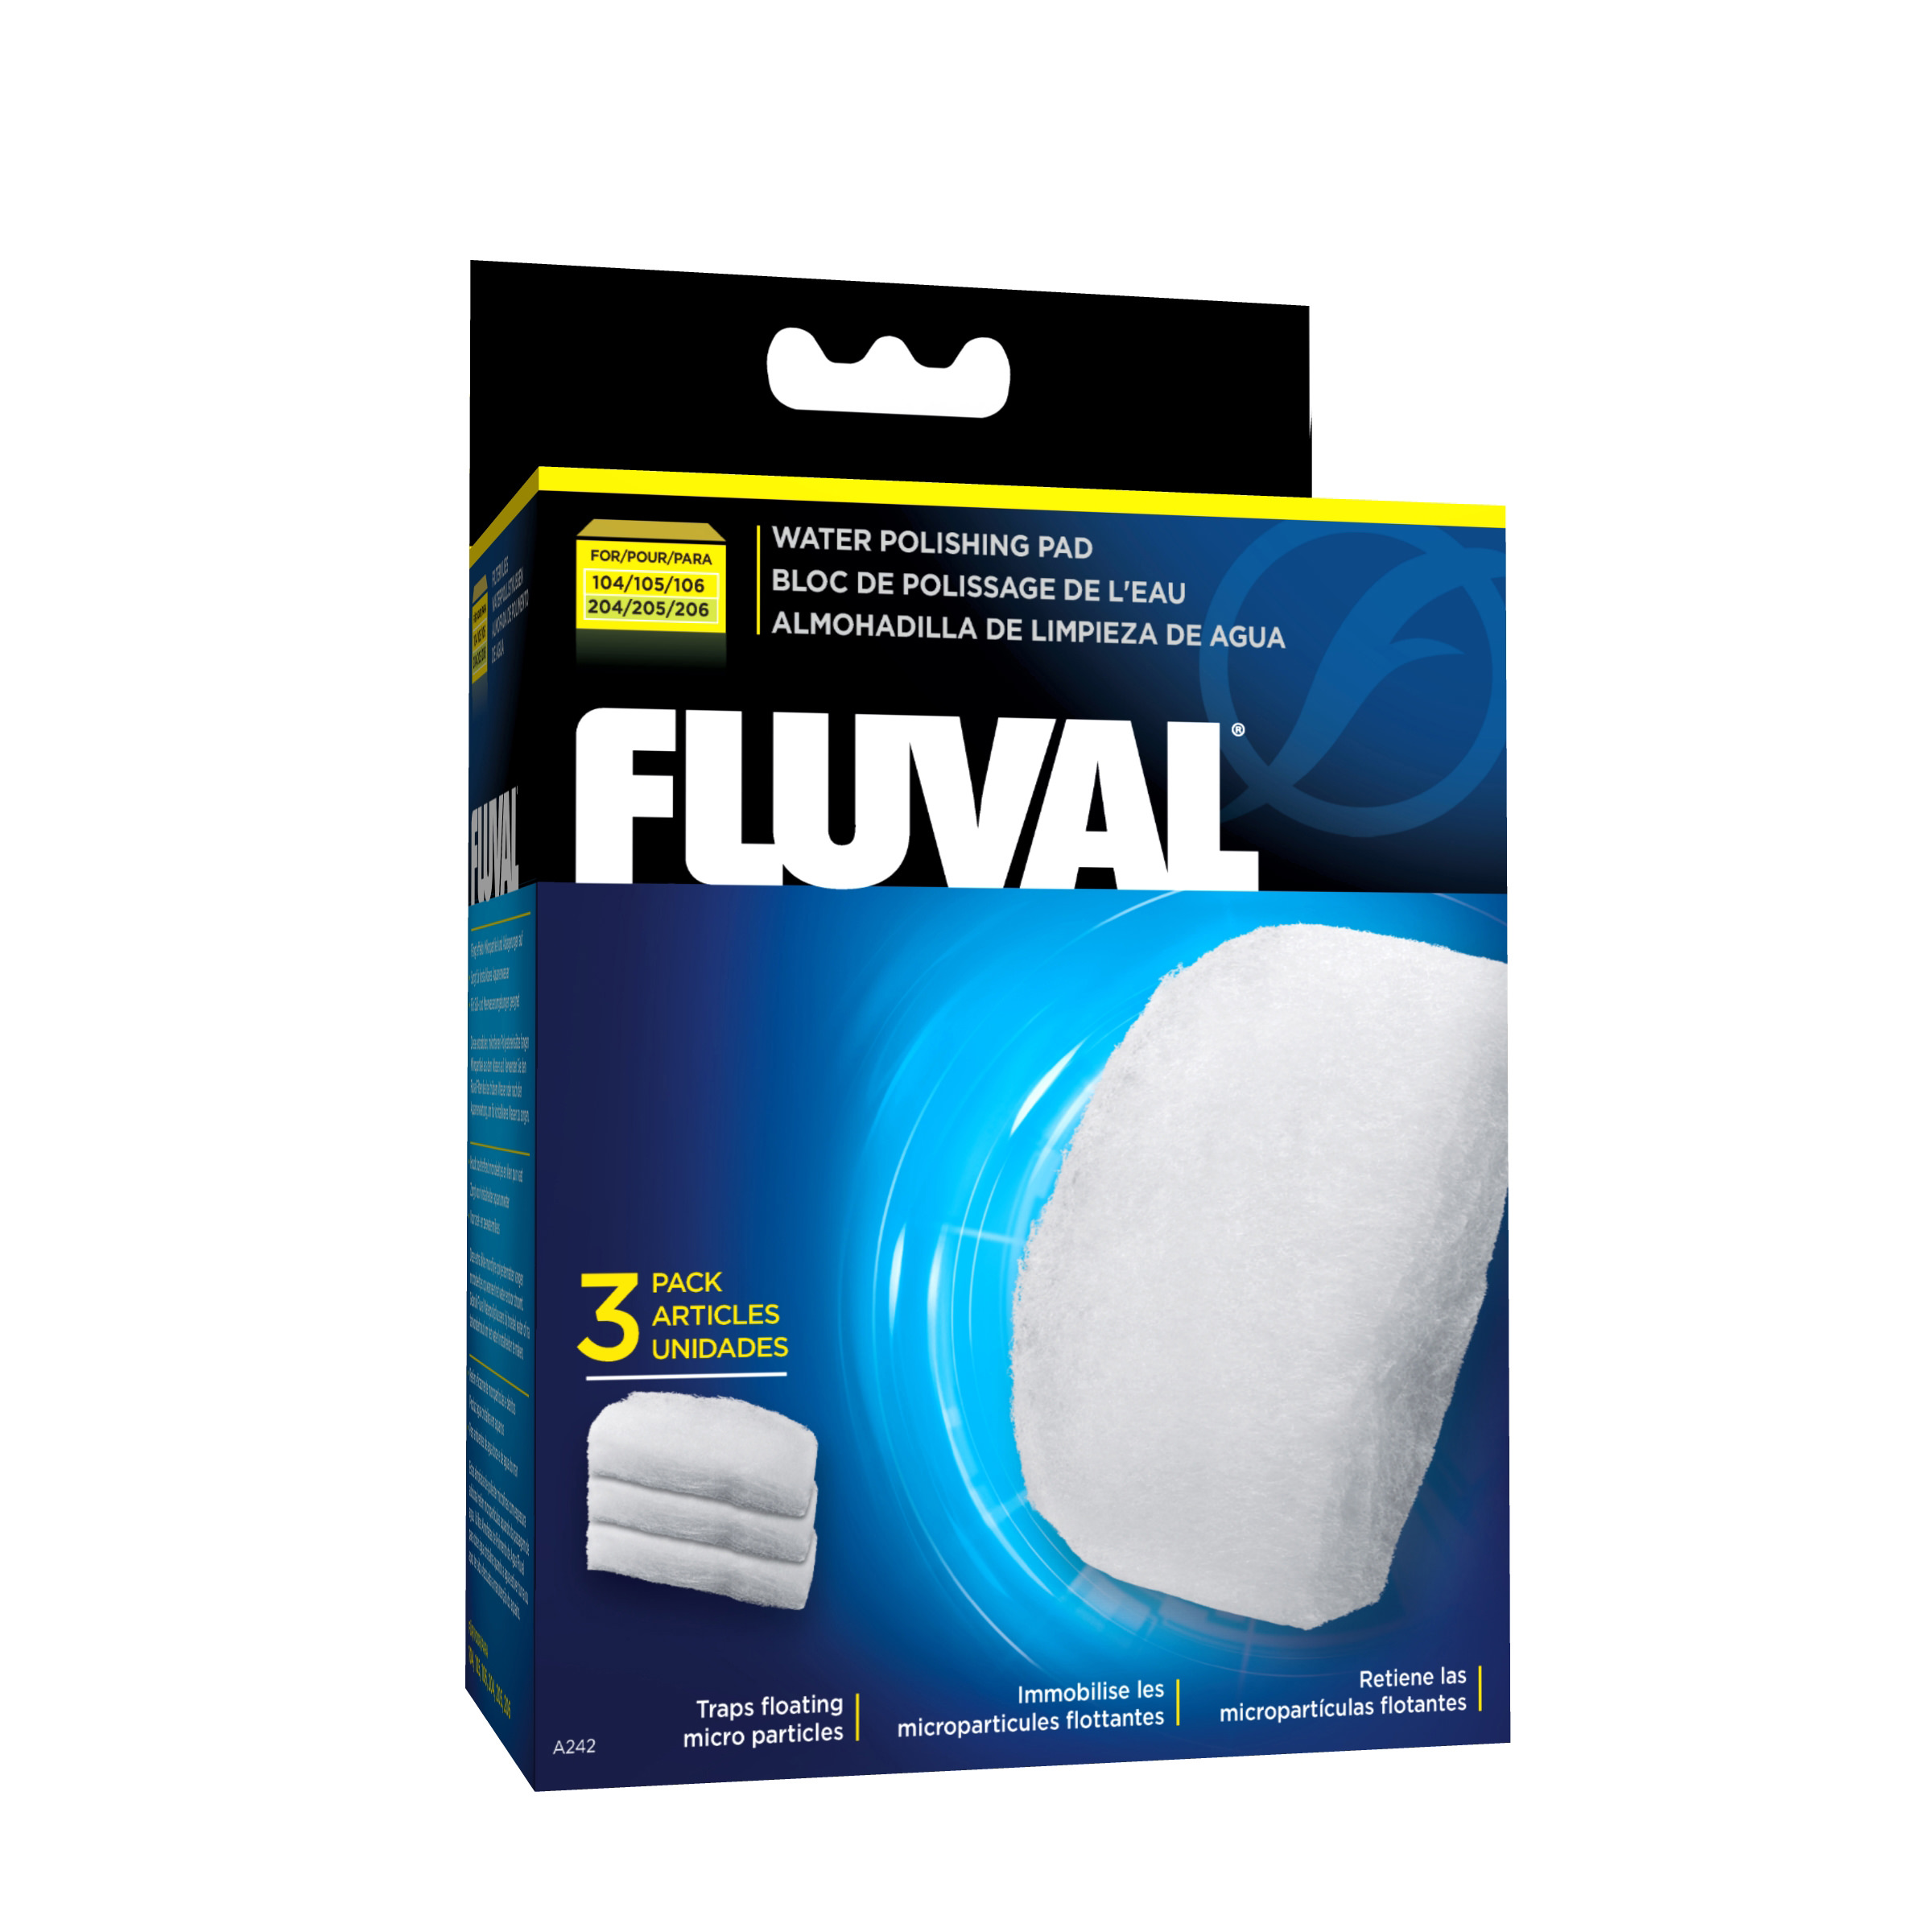 Fluv Water Polishing Pad 104/105/204/205